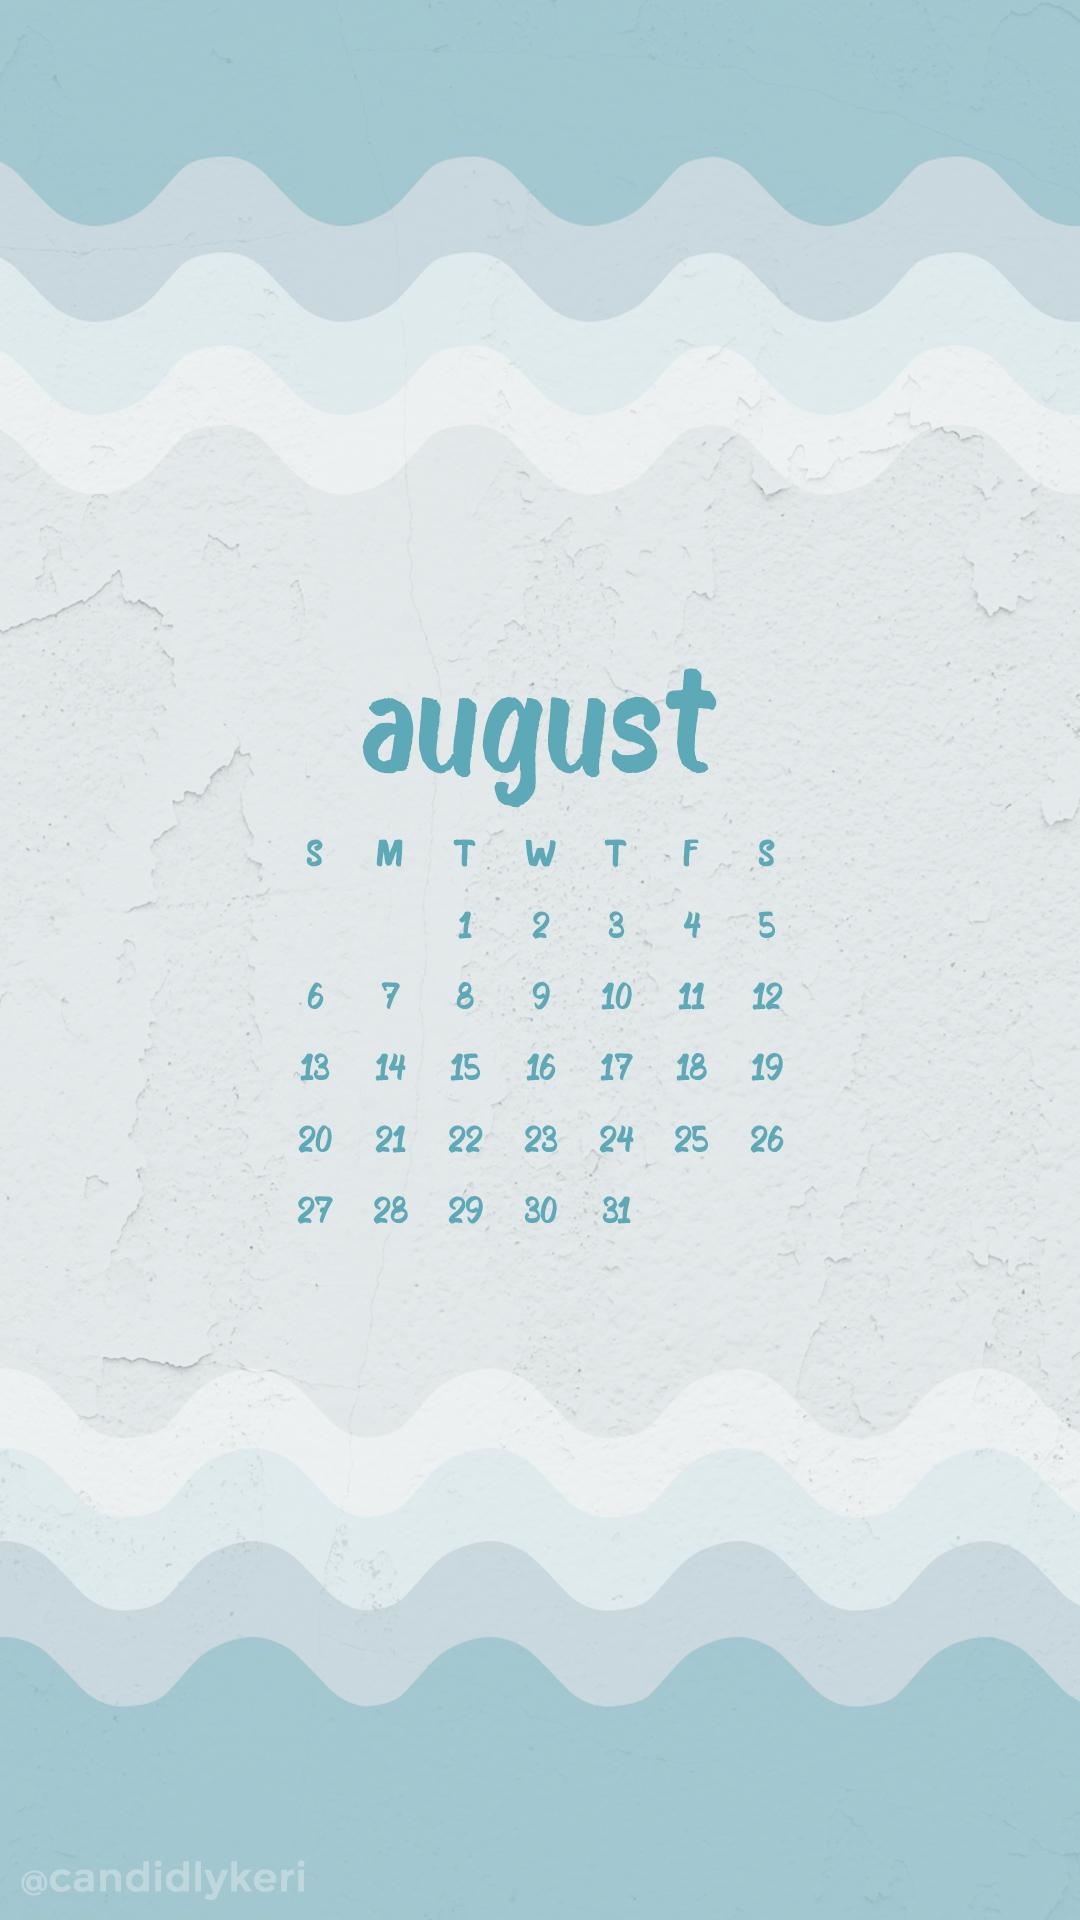 2017_August9M